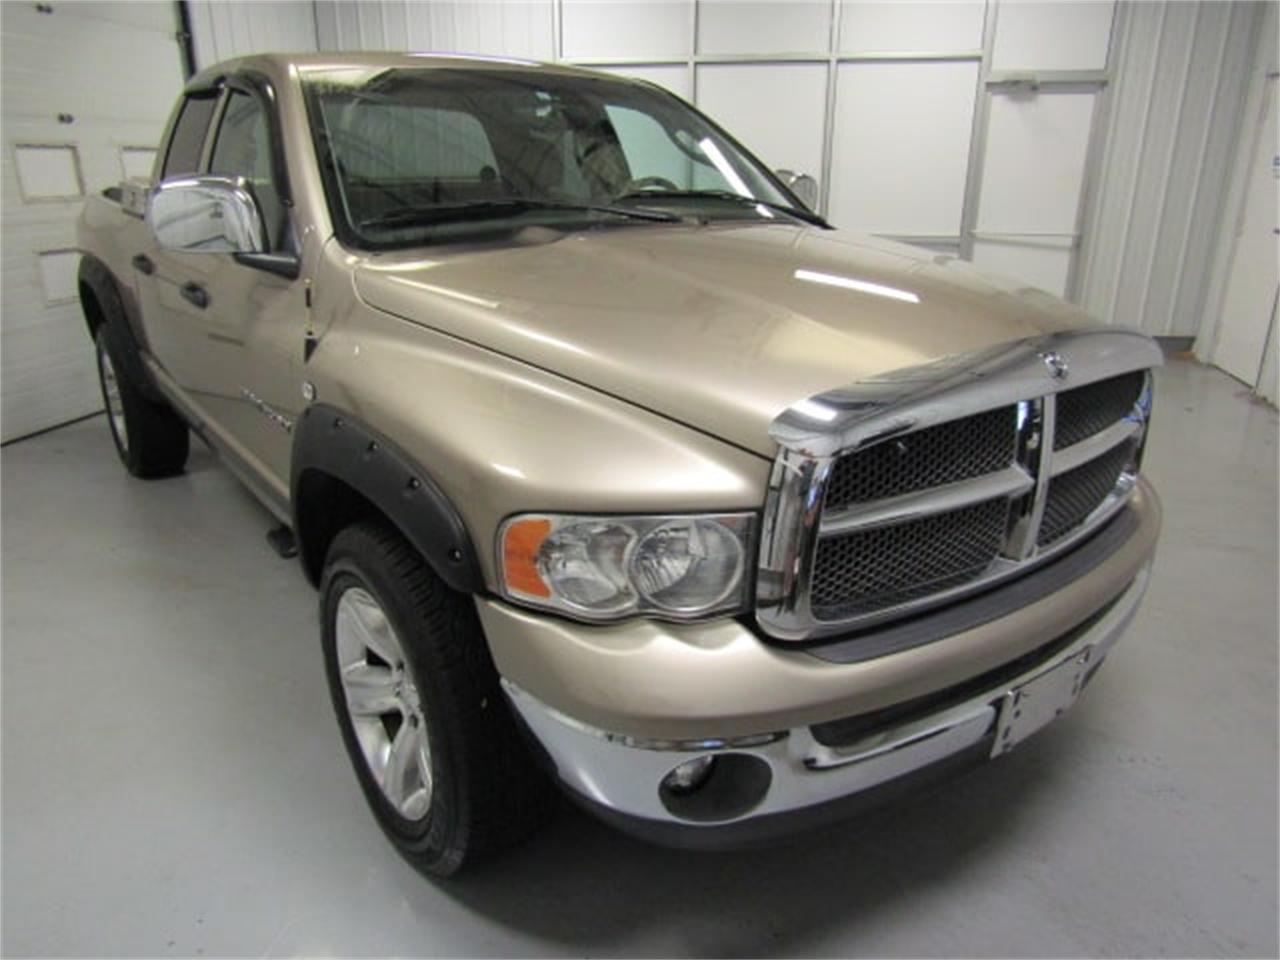 2002 Dodge Ram 1500 For Sale >> For Sale 2002 Dodge Ram 1500 In Christiansburg Virginia